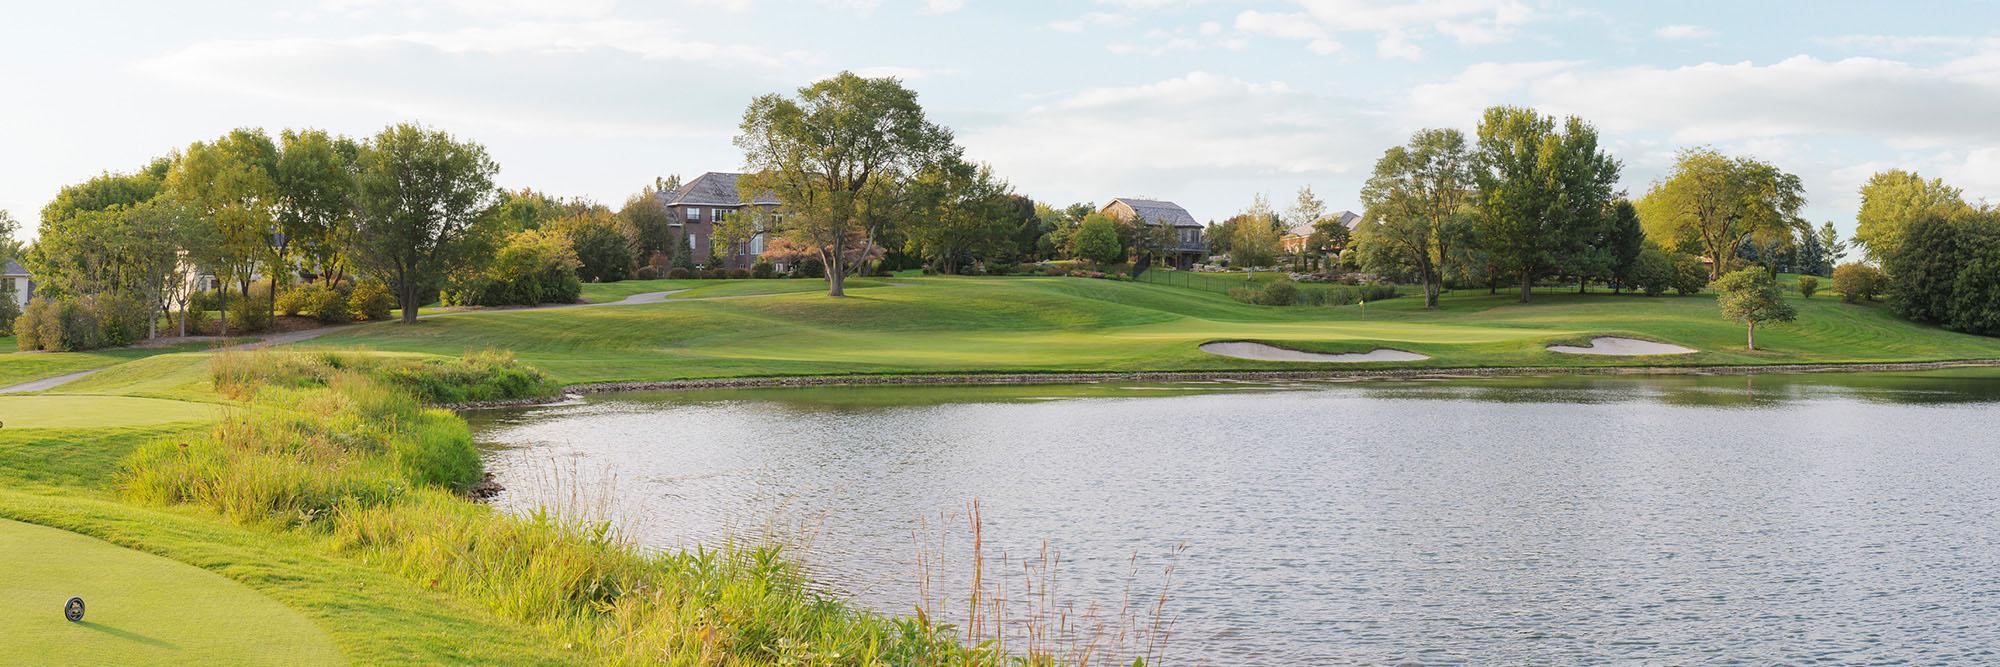 Golf Course Image - Glen Oaks No. 14